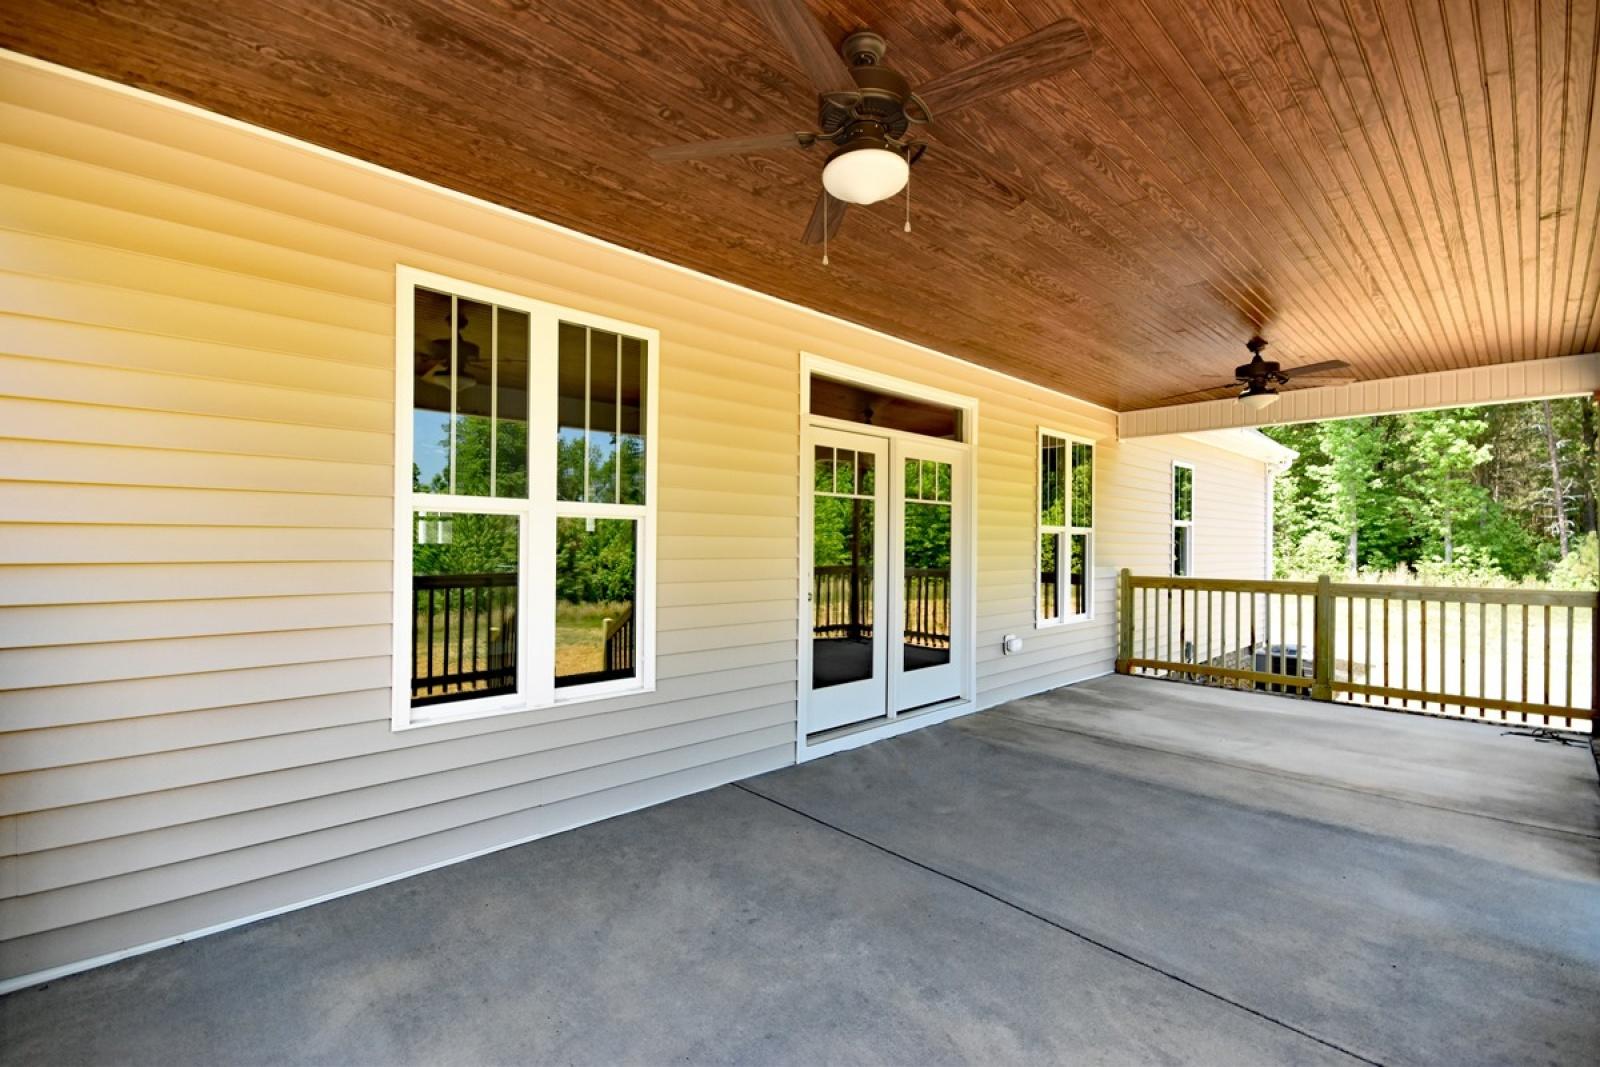 3070 Mattie Florence Drive, Graham, North Carolina 27253, 3 Bedrooms Bedrooms, 8 Rooms Rooms,2 BathroomsBathrooms,Coble Estates,For Sale,Hardesty,Mattie Florence,1,1028